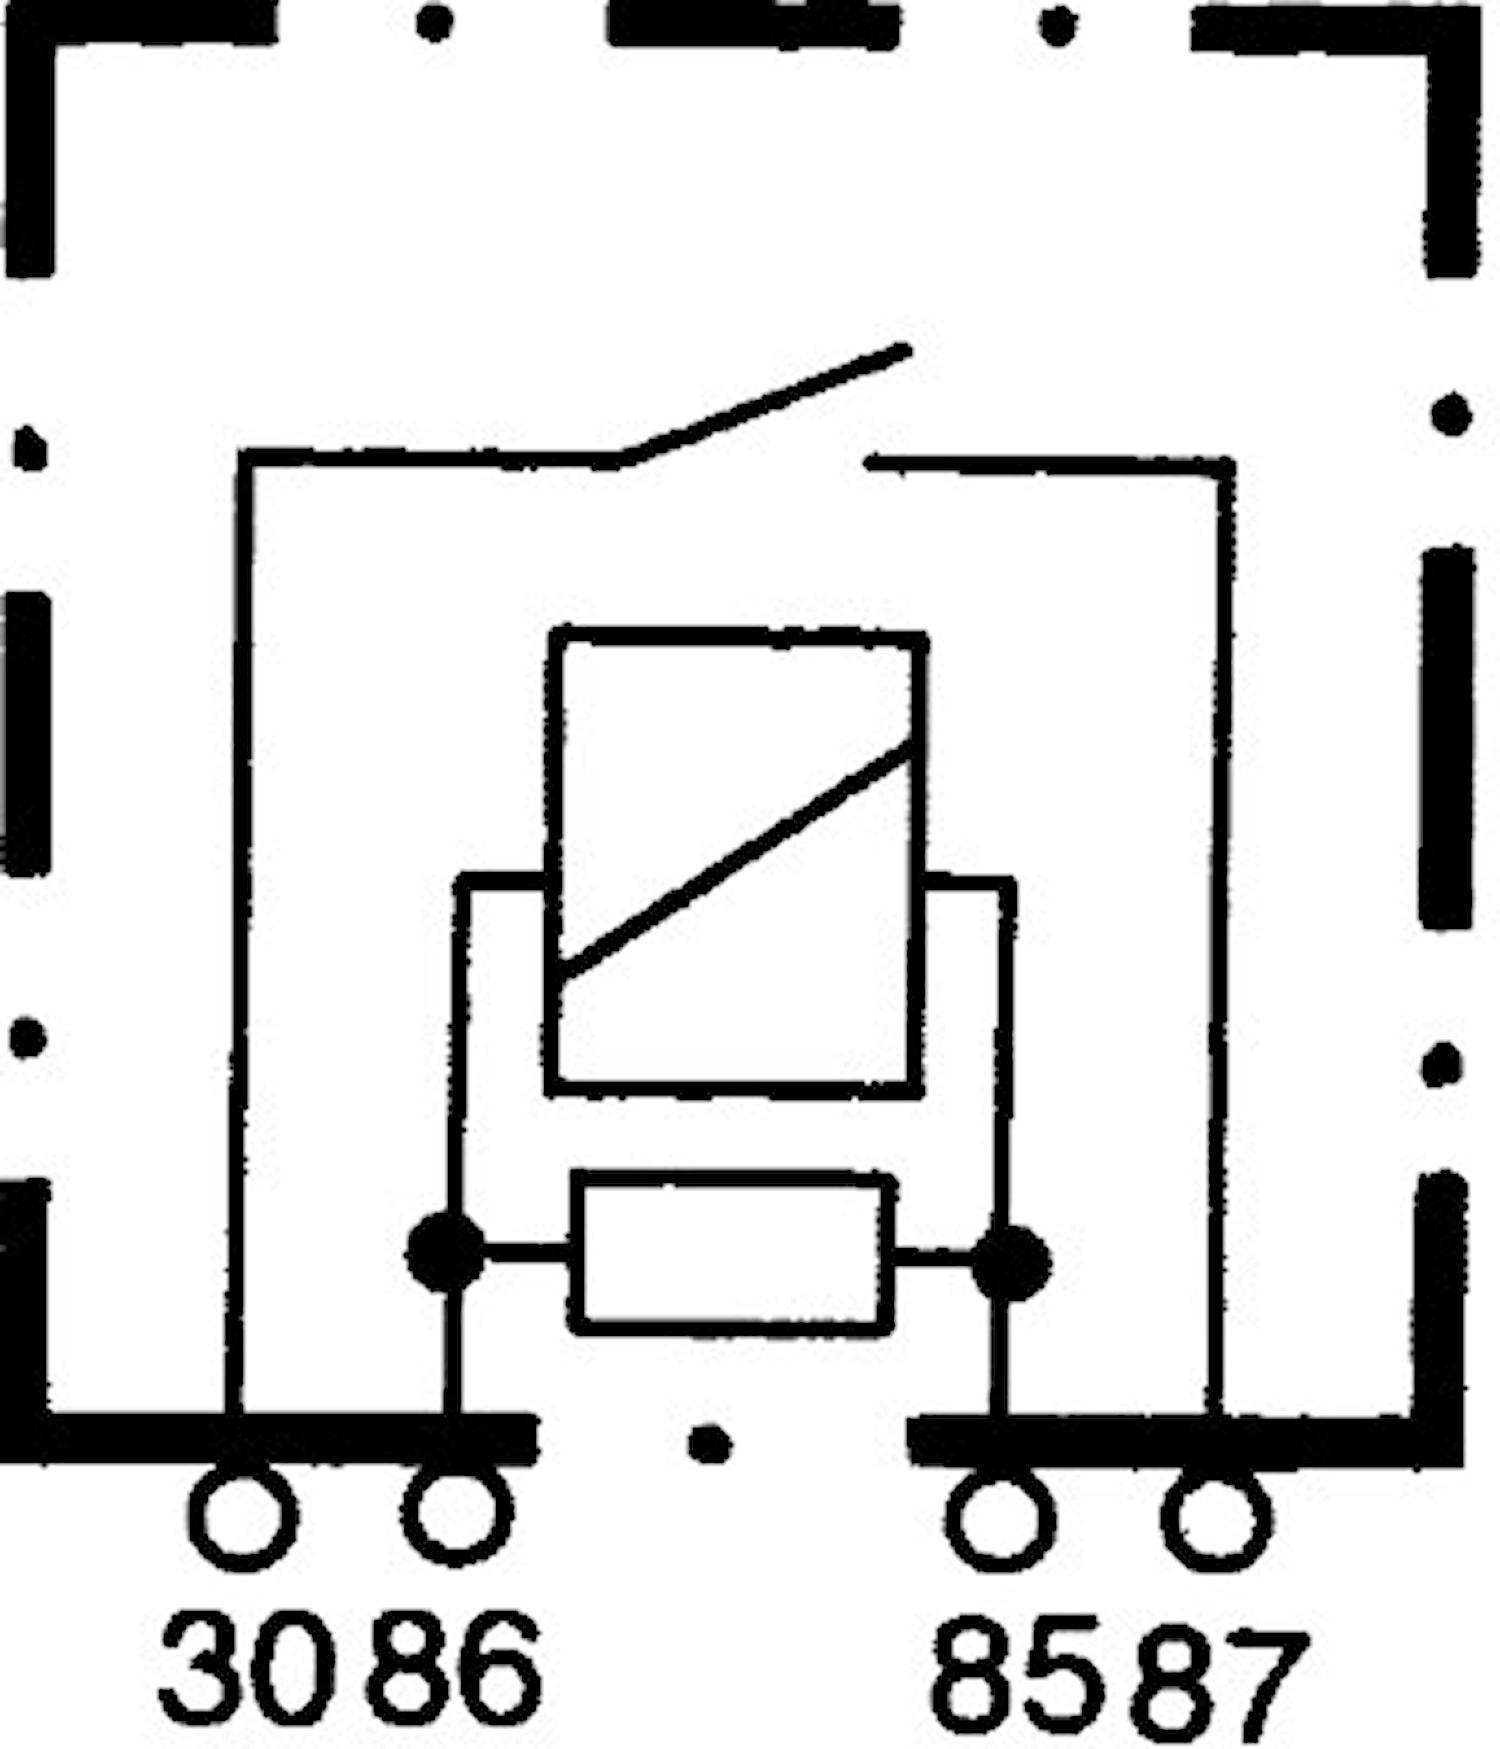 Microrelä 12V 20A utan fäste